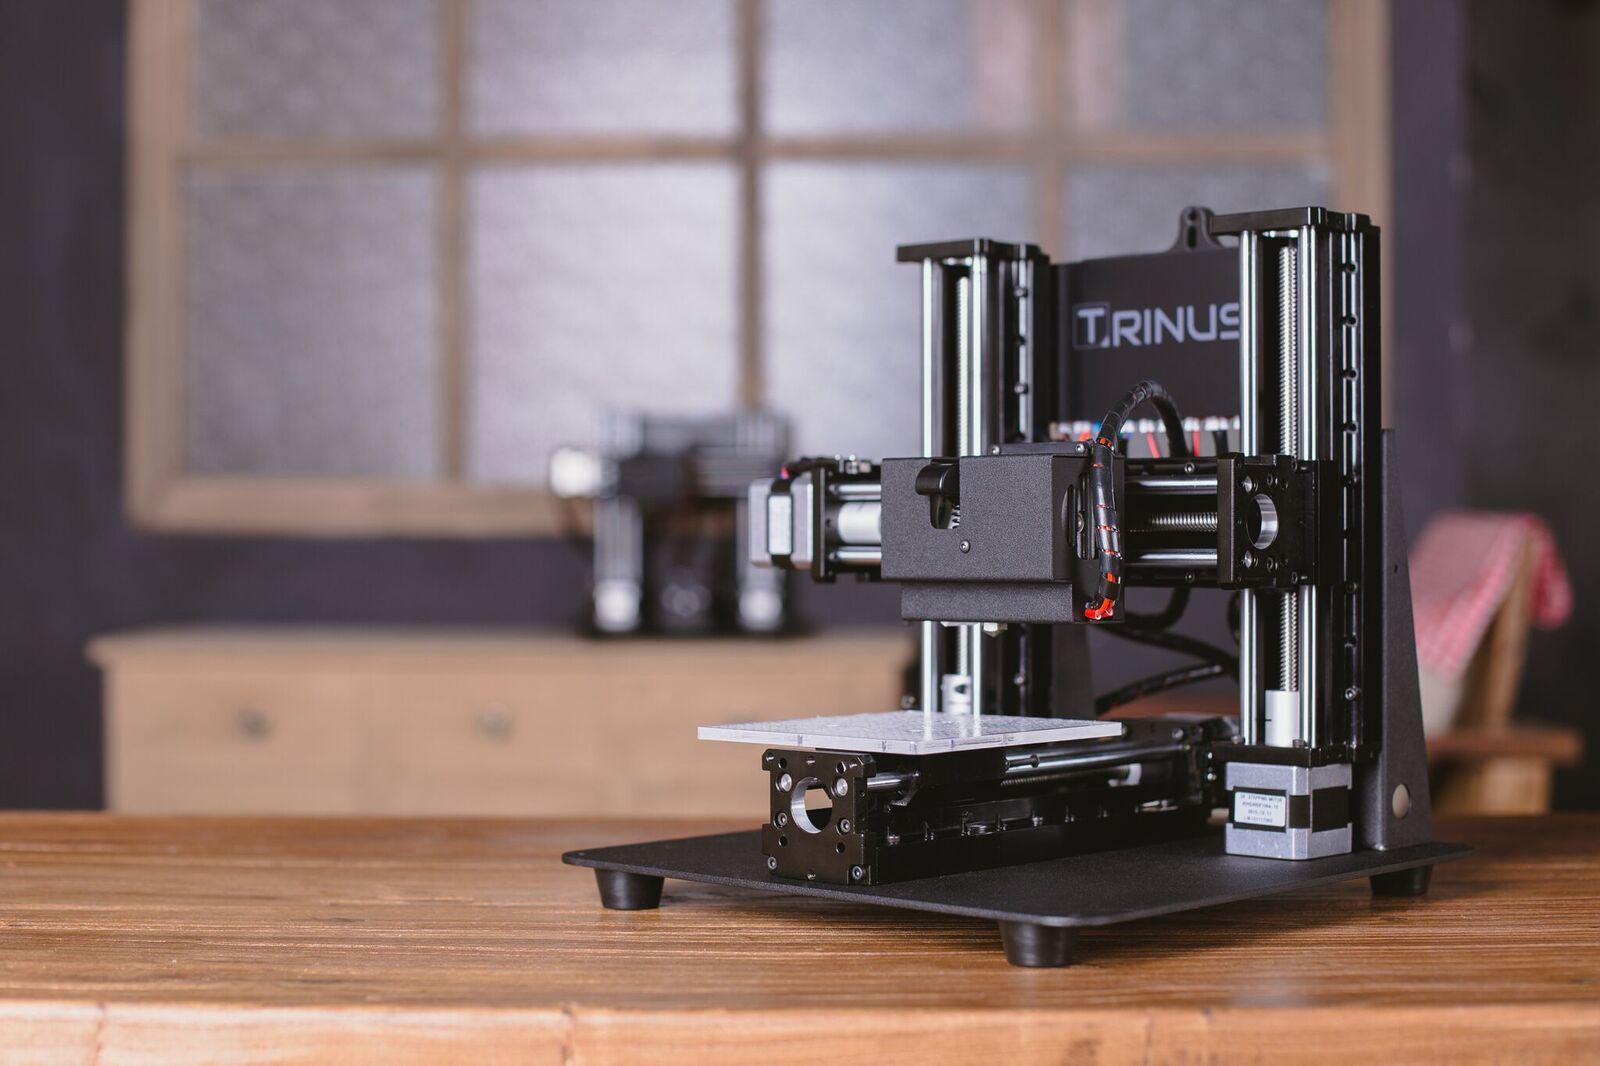 trinus-3d-printer-299-08